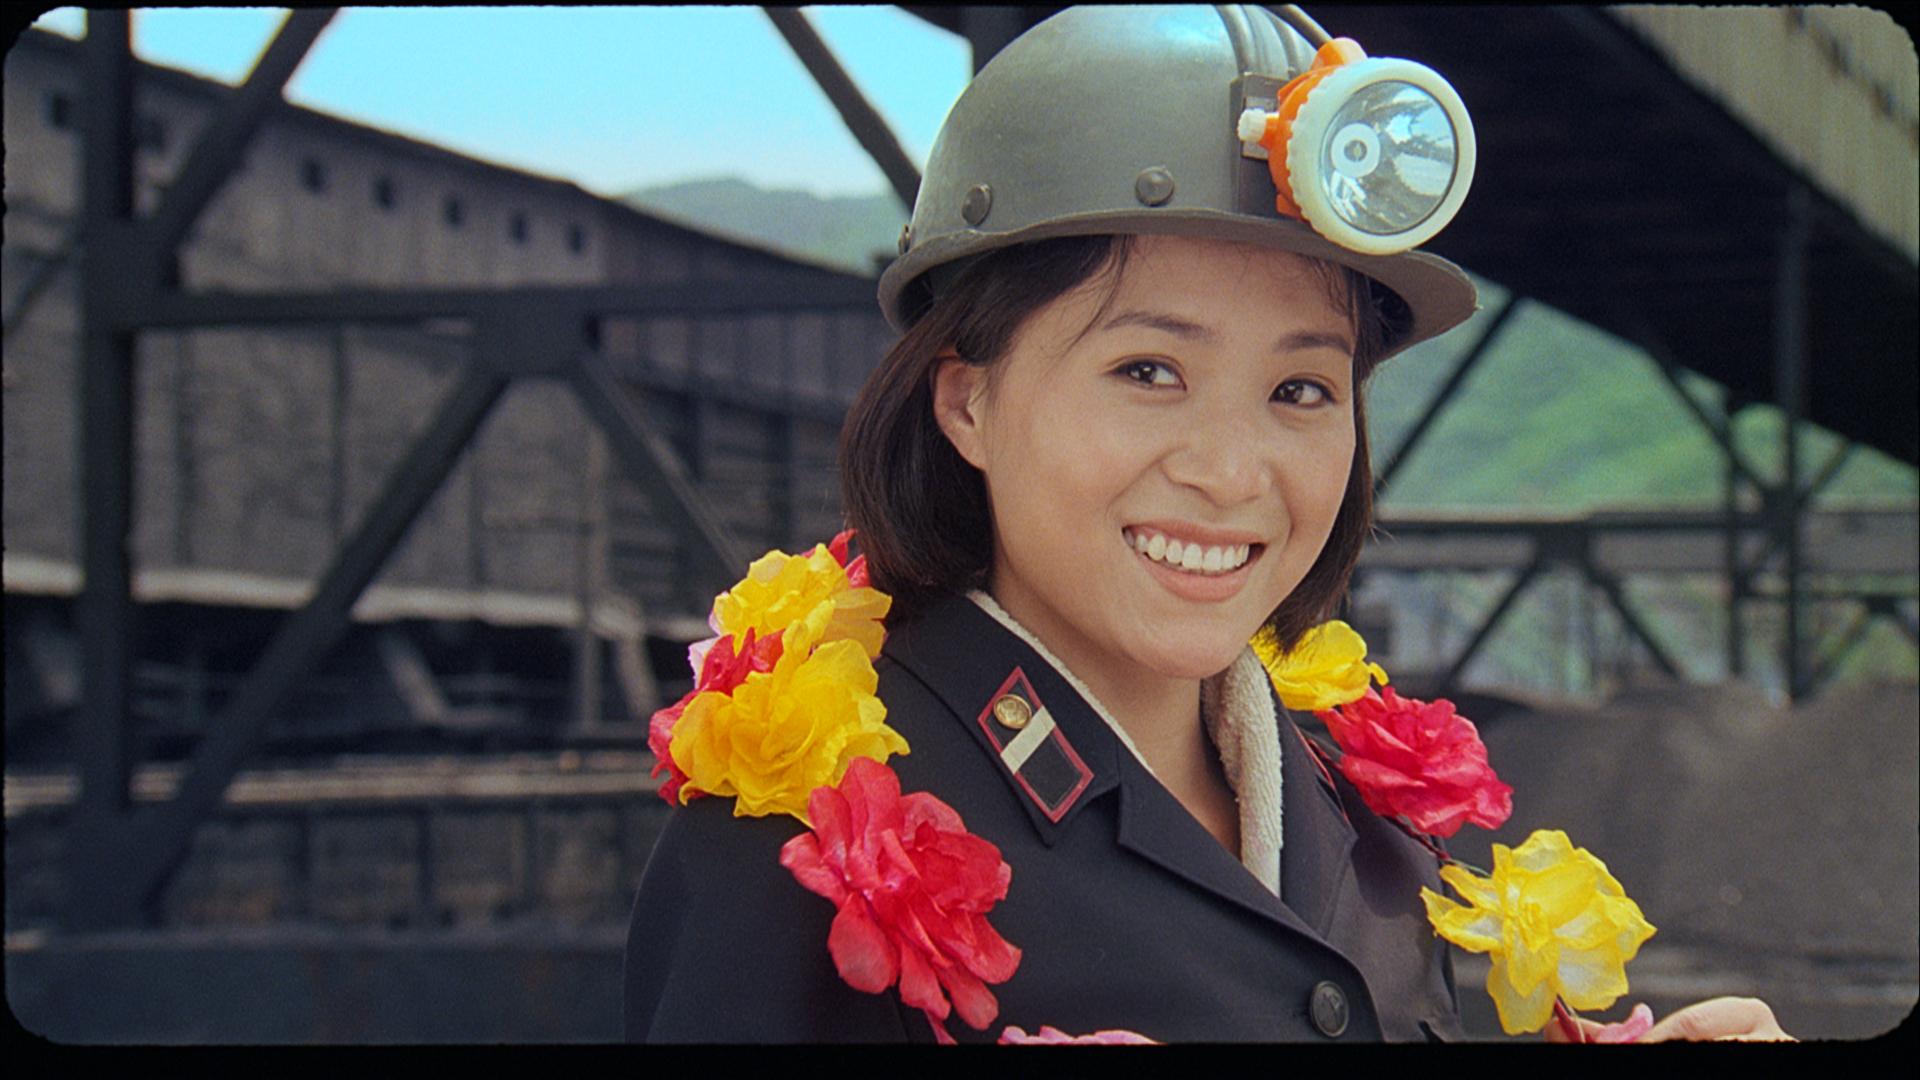 COMRADE KIM GOES FLYING + Q&A   dir. Kim Gwang Hun, Nicholas Bonner, Anja Daelemans  North Korea